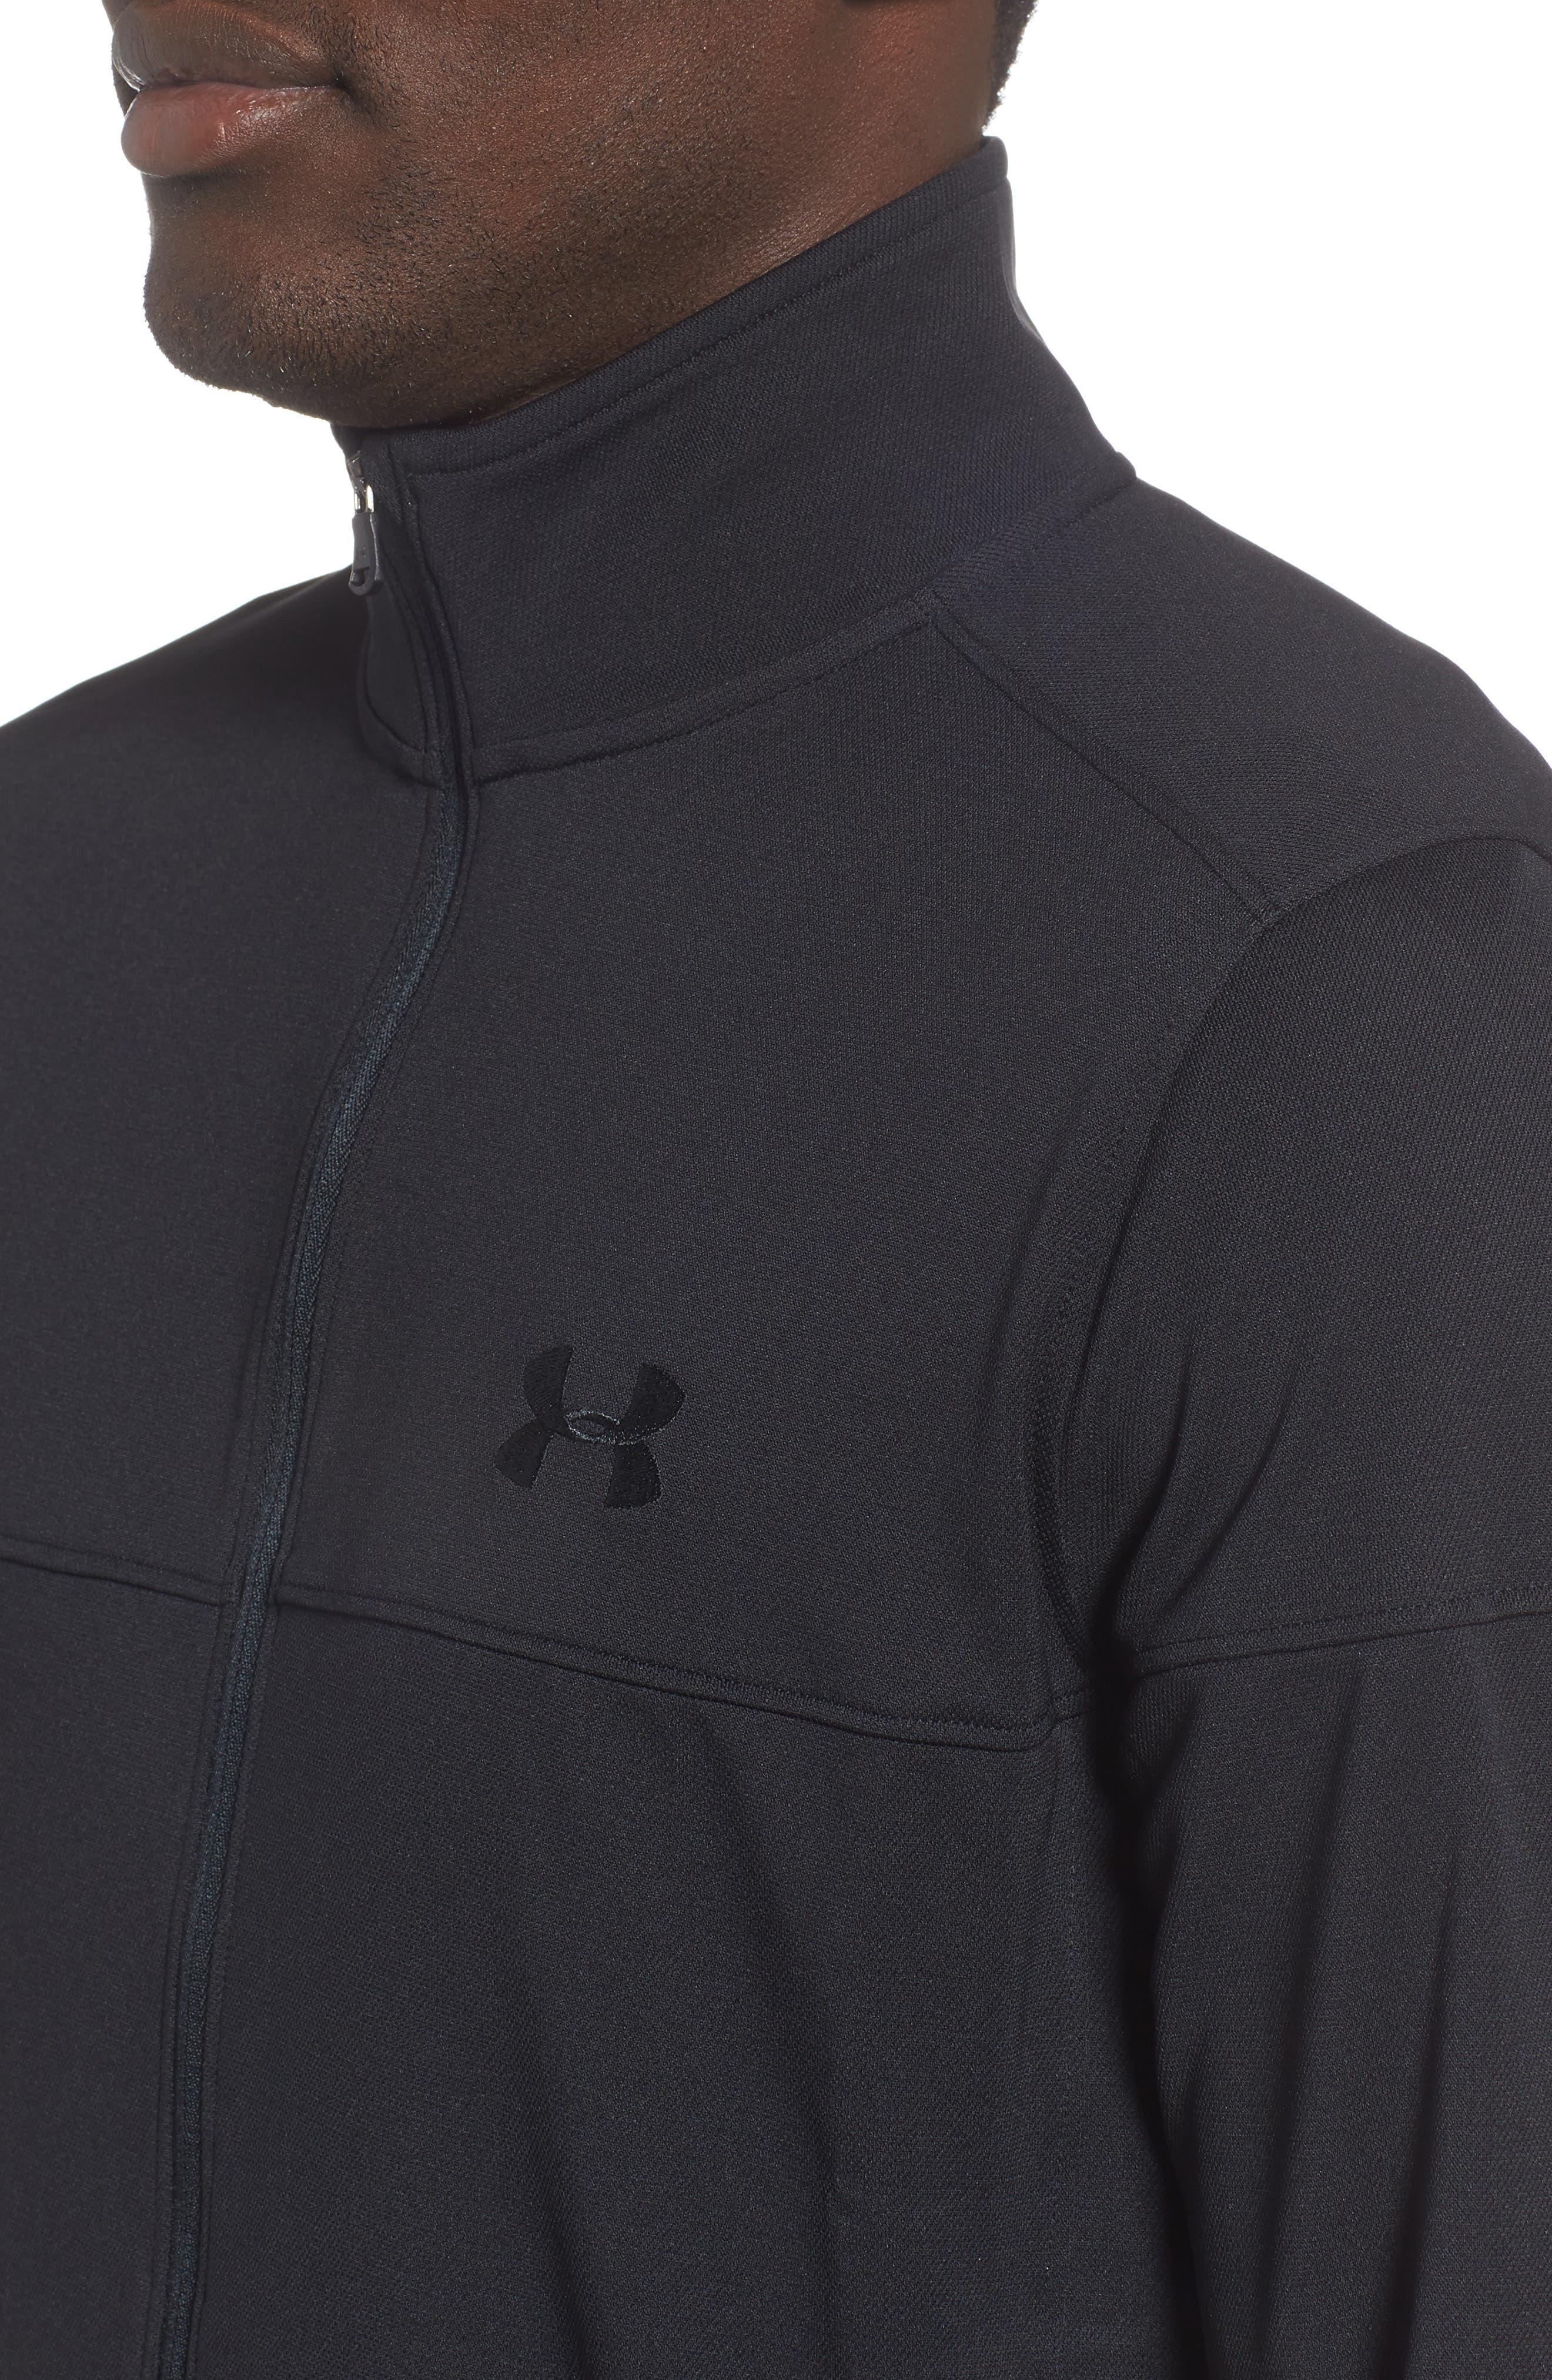 Sportstyle Piqué Track Jacket,                             Alternate thumbnail 4, color,                             BLACK / / BLACK